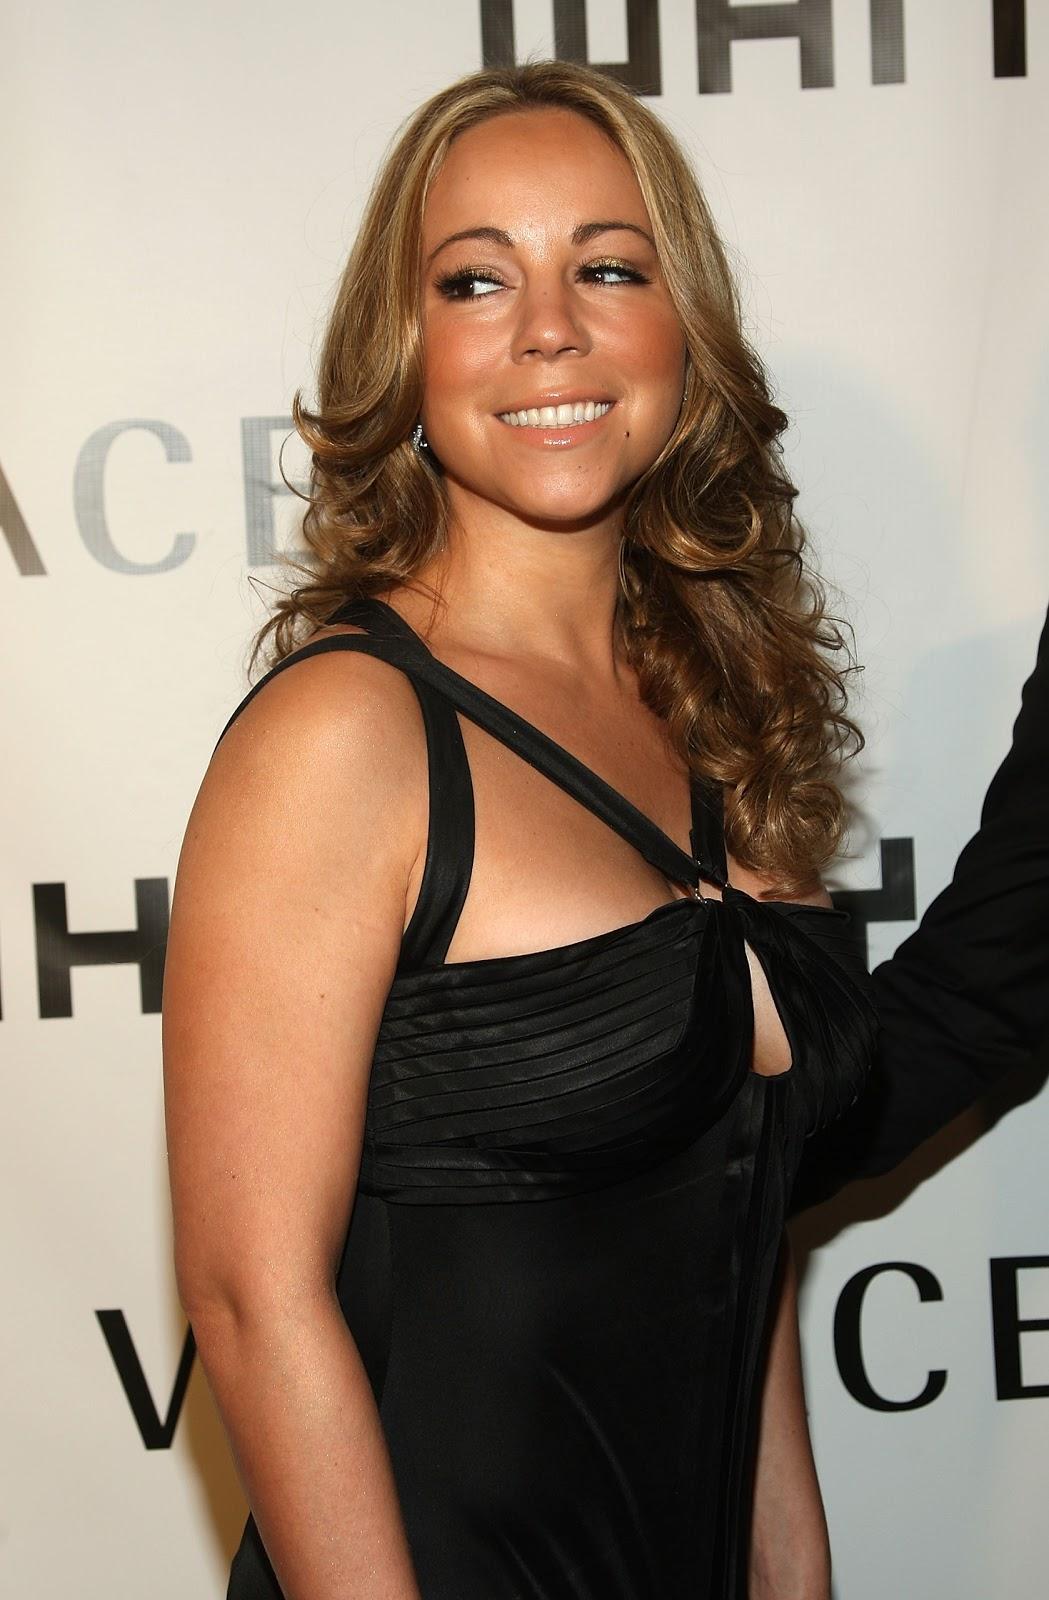 http://2.bp.blogspot.com/-md8_Skj7Rr8/UBbuDMFfSyI/AAAAAAAAFKk/SV7dfMlbz7U/s1600/Mariah-Carey-hairstyles-celebrity-actress-singer-wallpaper-songwriter-carey-mariah+(5).jpg